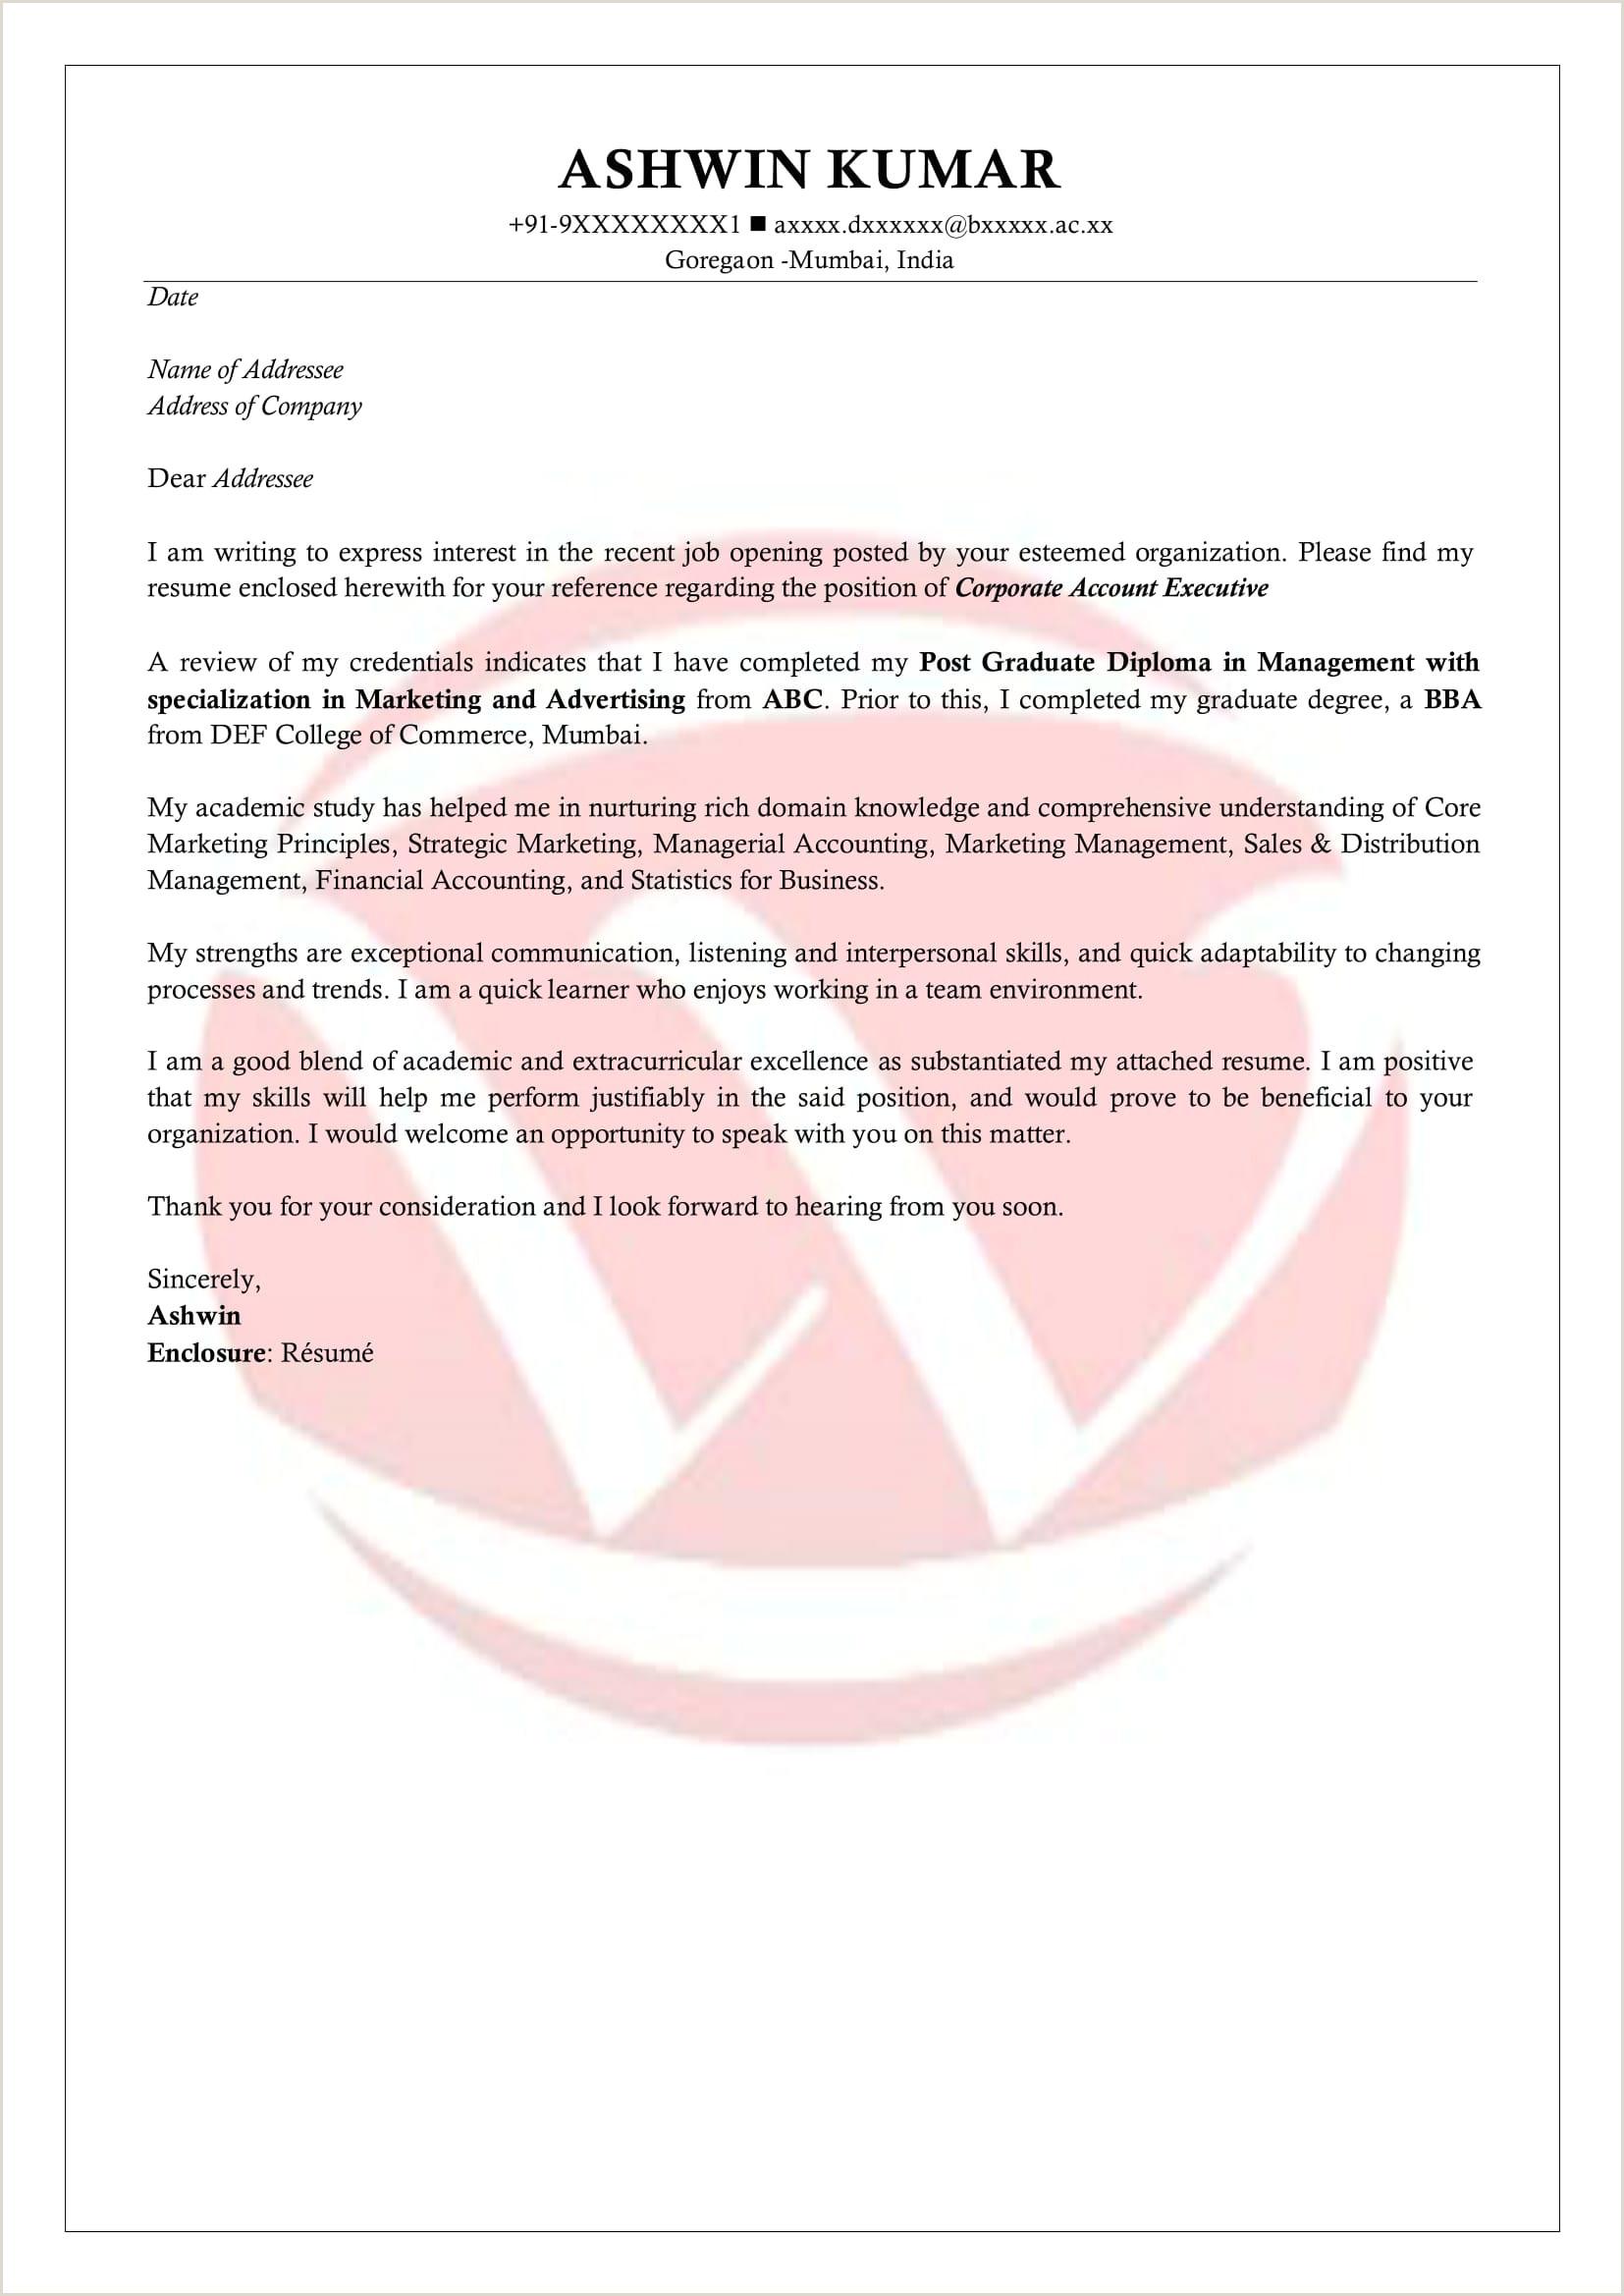 Cv Format For Logistics Fresher Freshers Sample Cover Letter Format Download Cover Letter